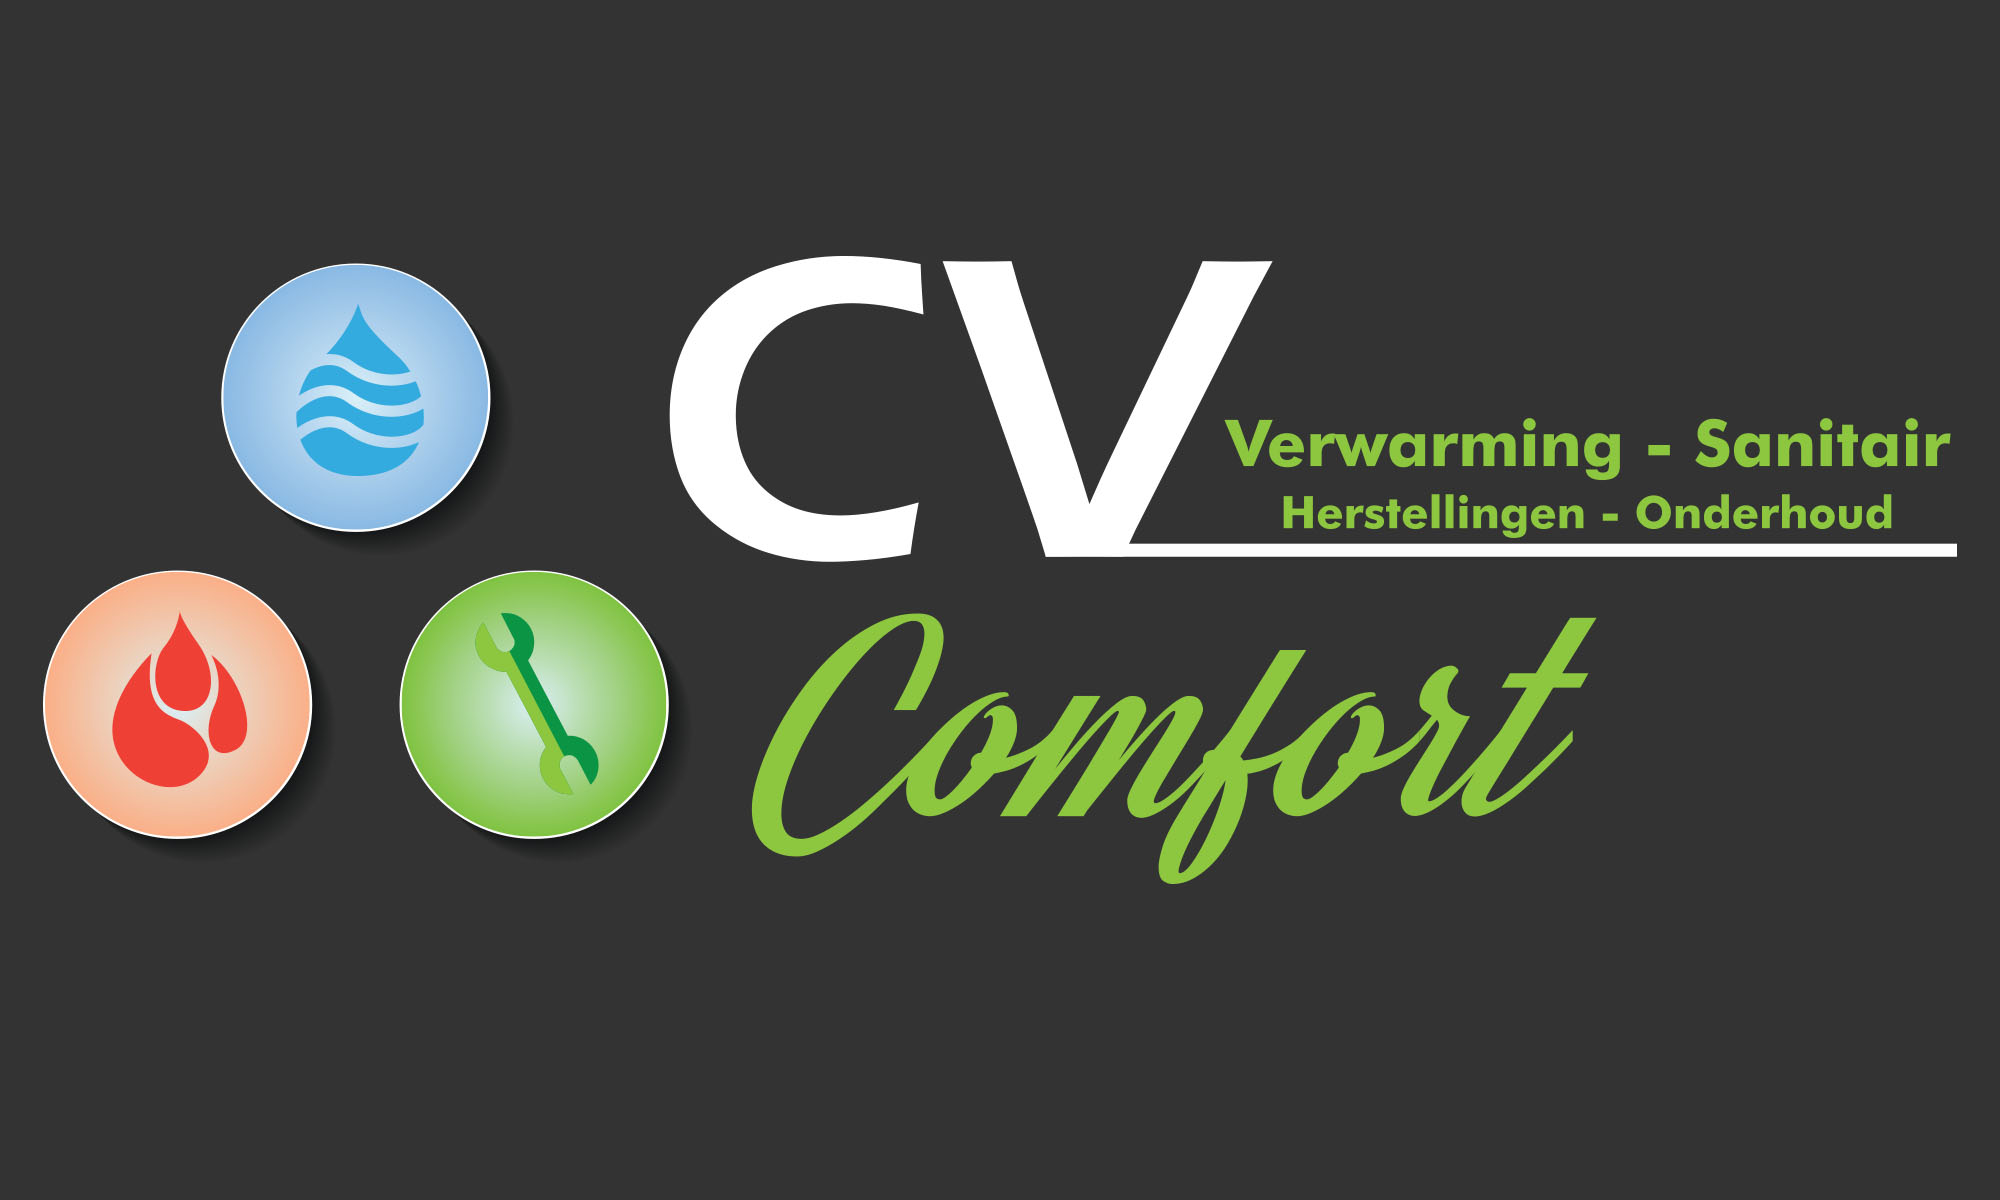 Cv Comfort